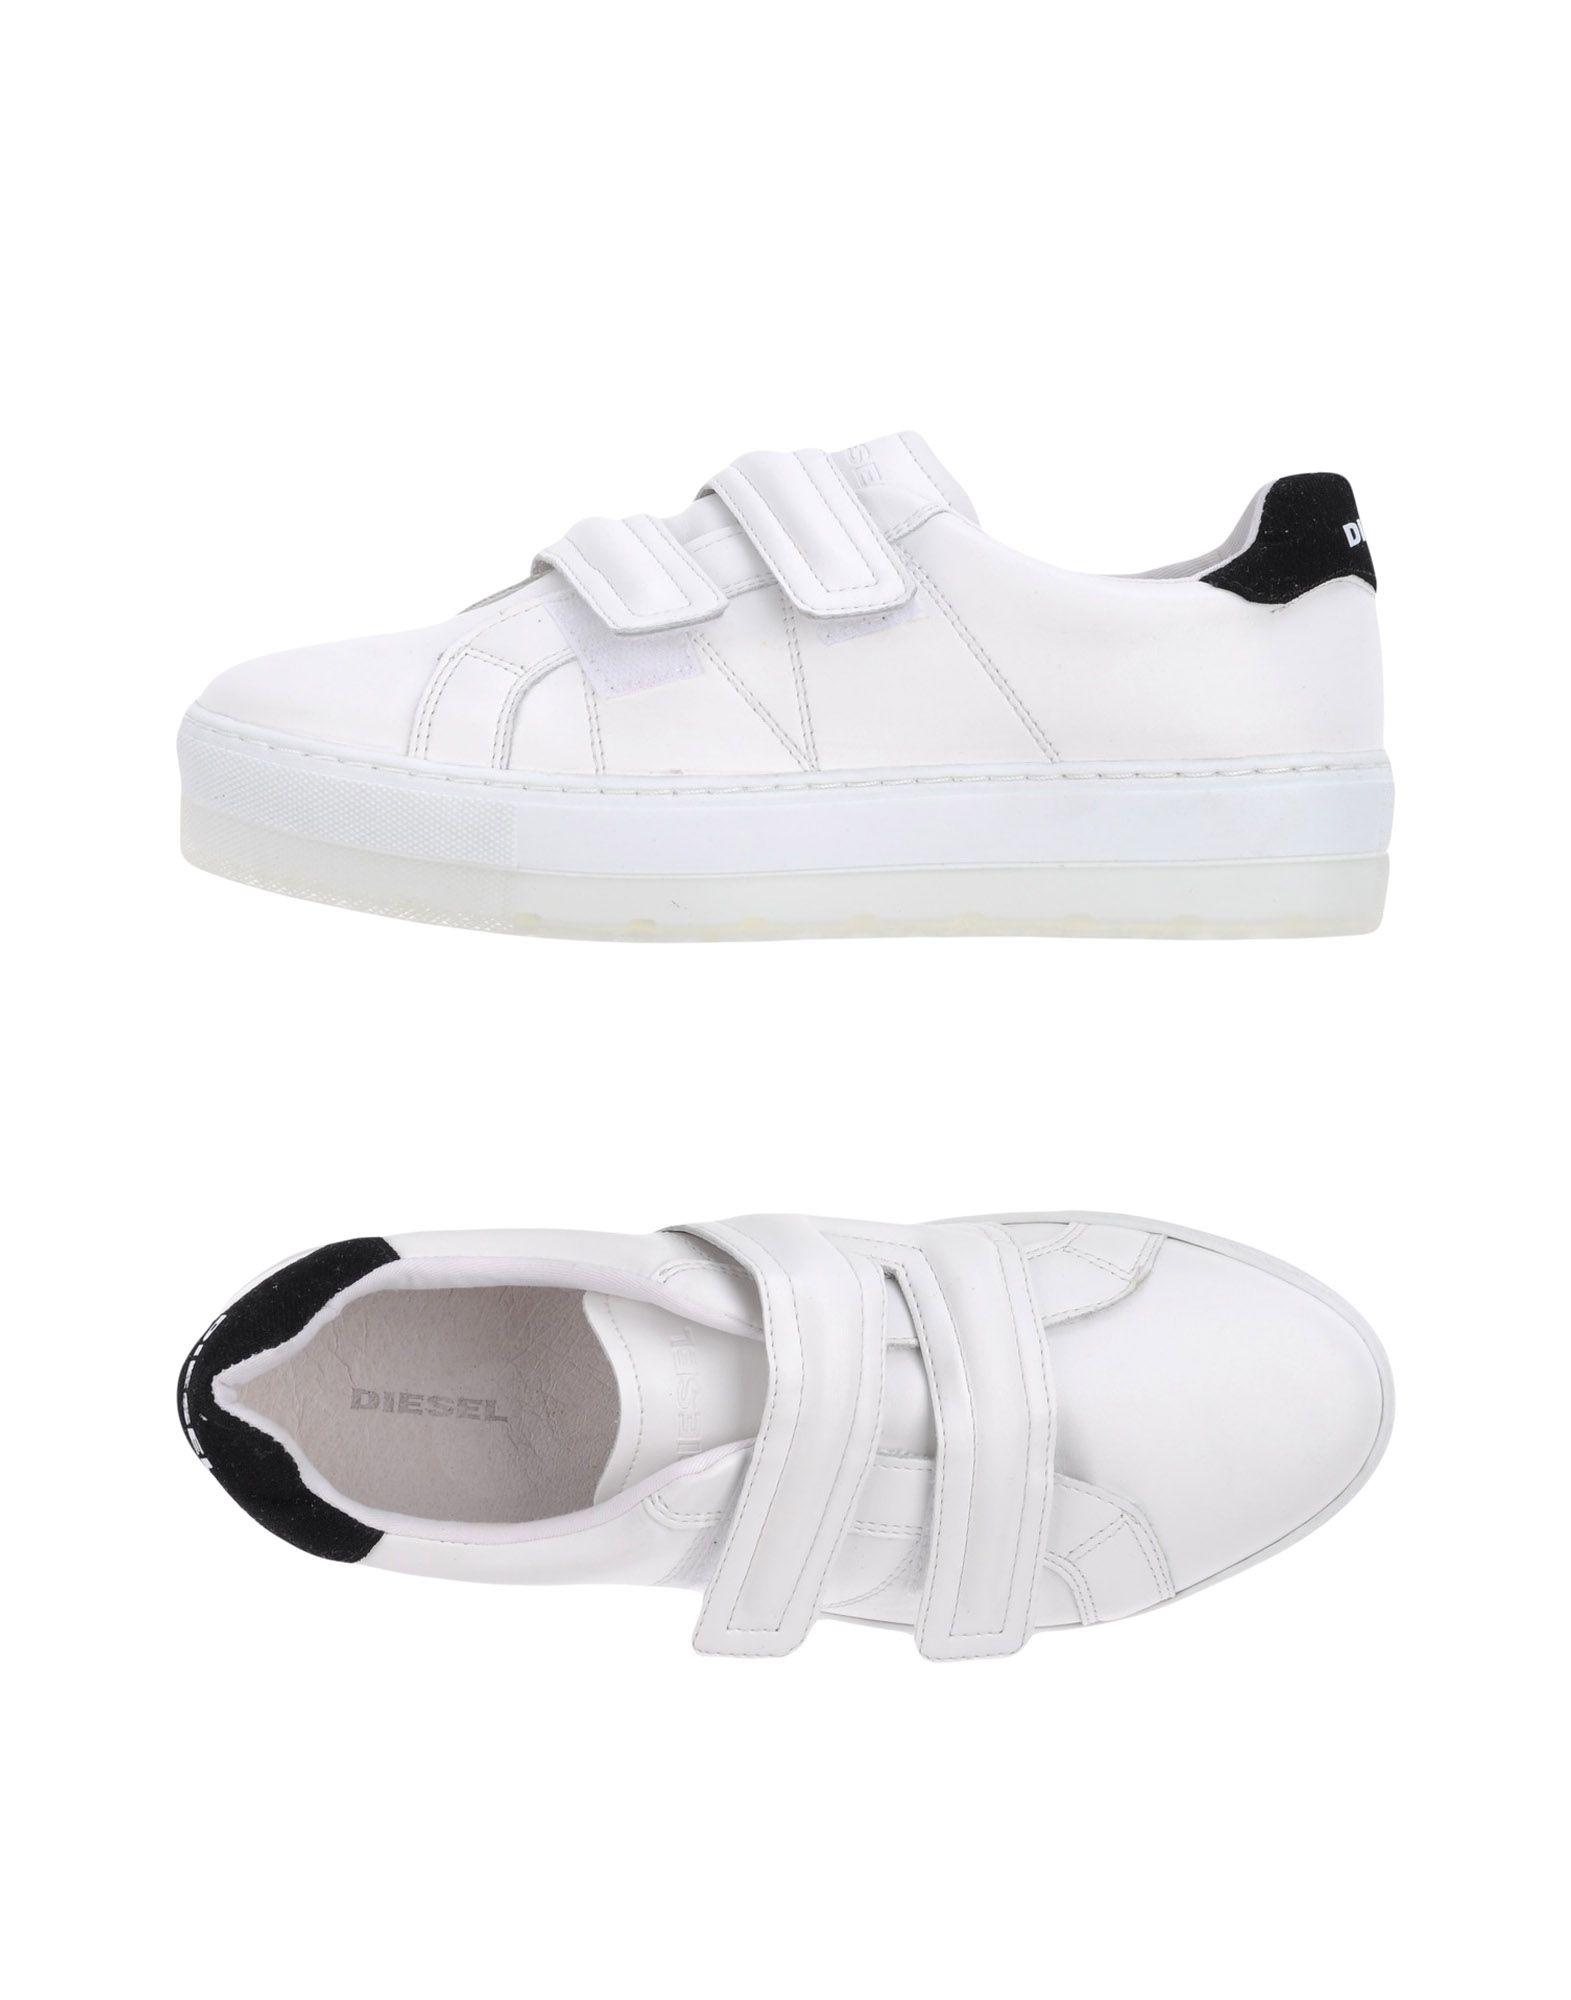 Diesel Sneakers Damen  11308994AJ Gute Qualität beliebte Schuhe